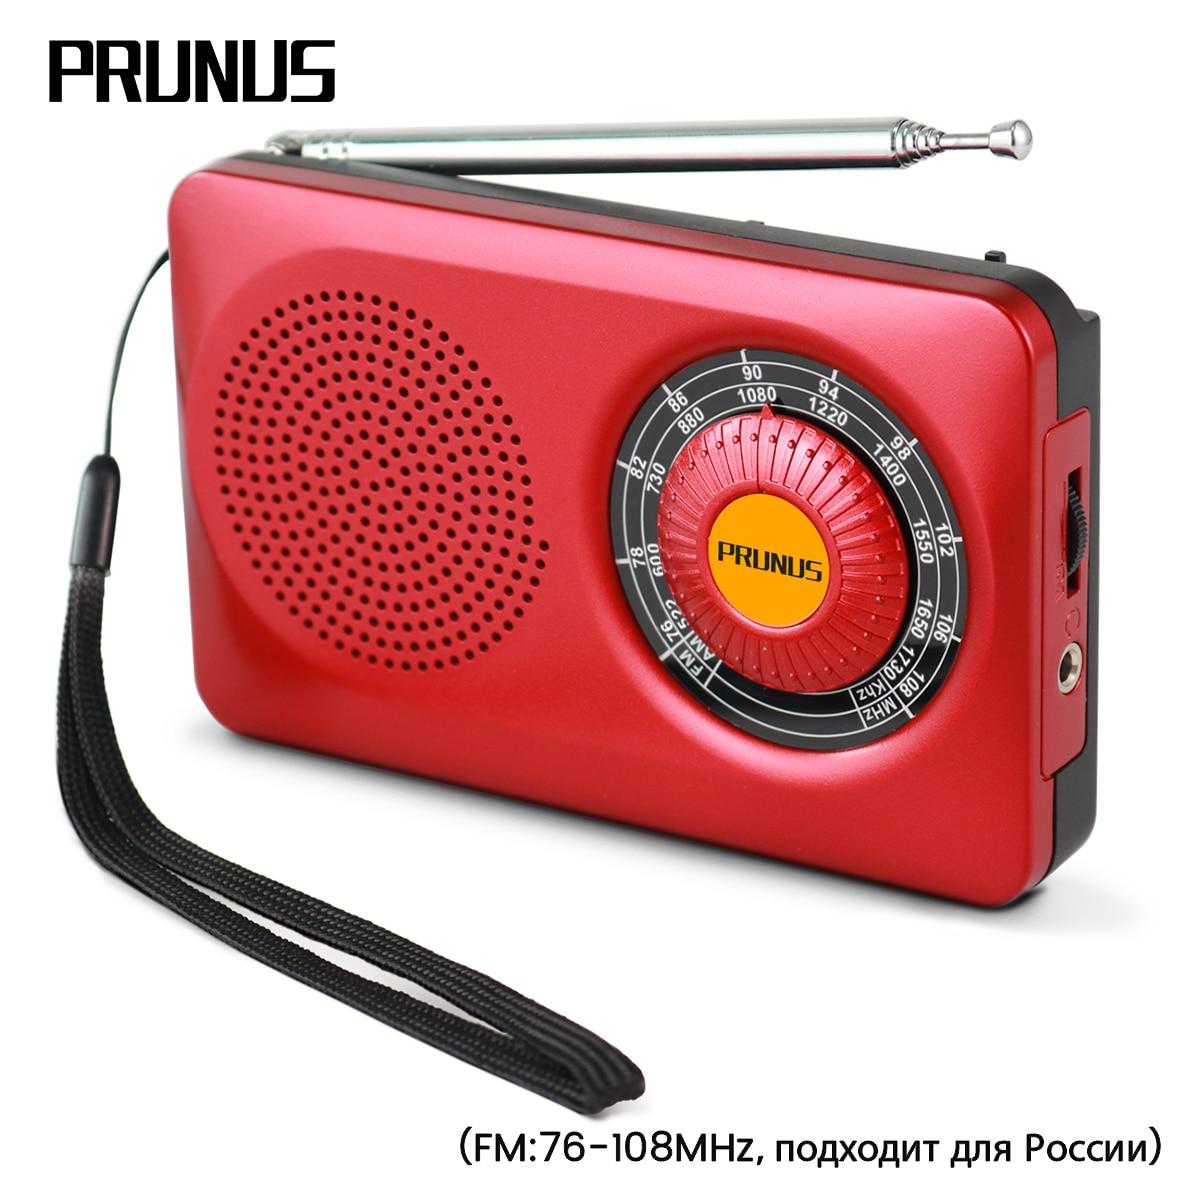 PRUNUS J-115 Portable Pocket Radio Fm Radio Receiver 3.5mm Earphone Jack  360° Rotating Antenna 76 - 108 MHz AA Battery Red